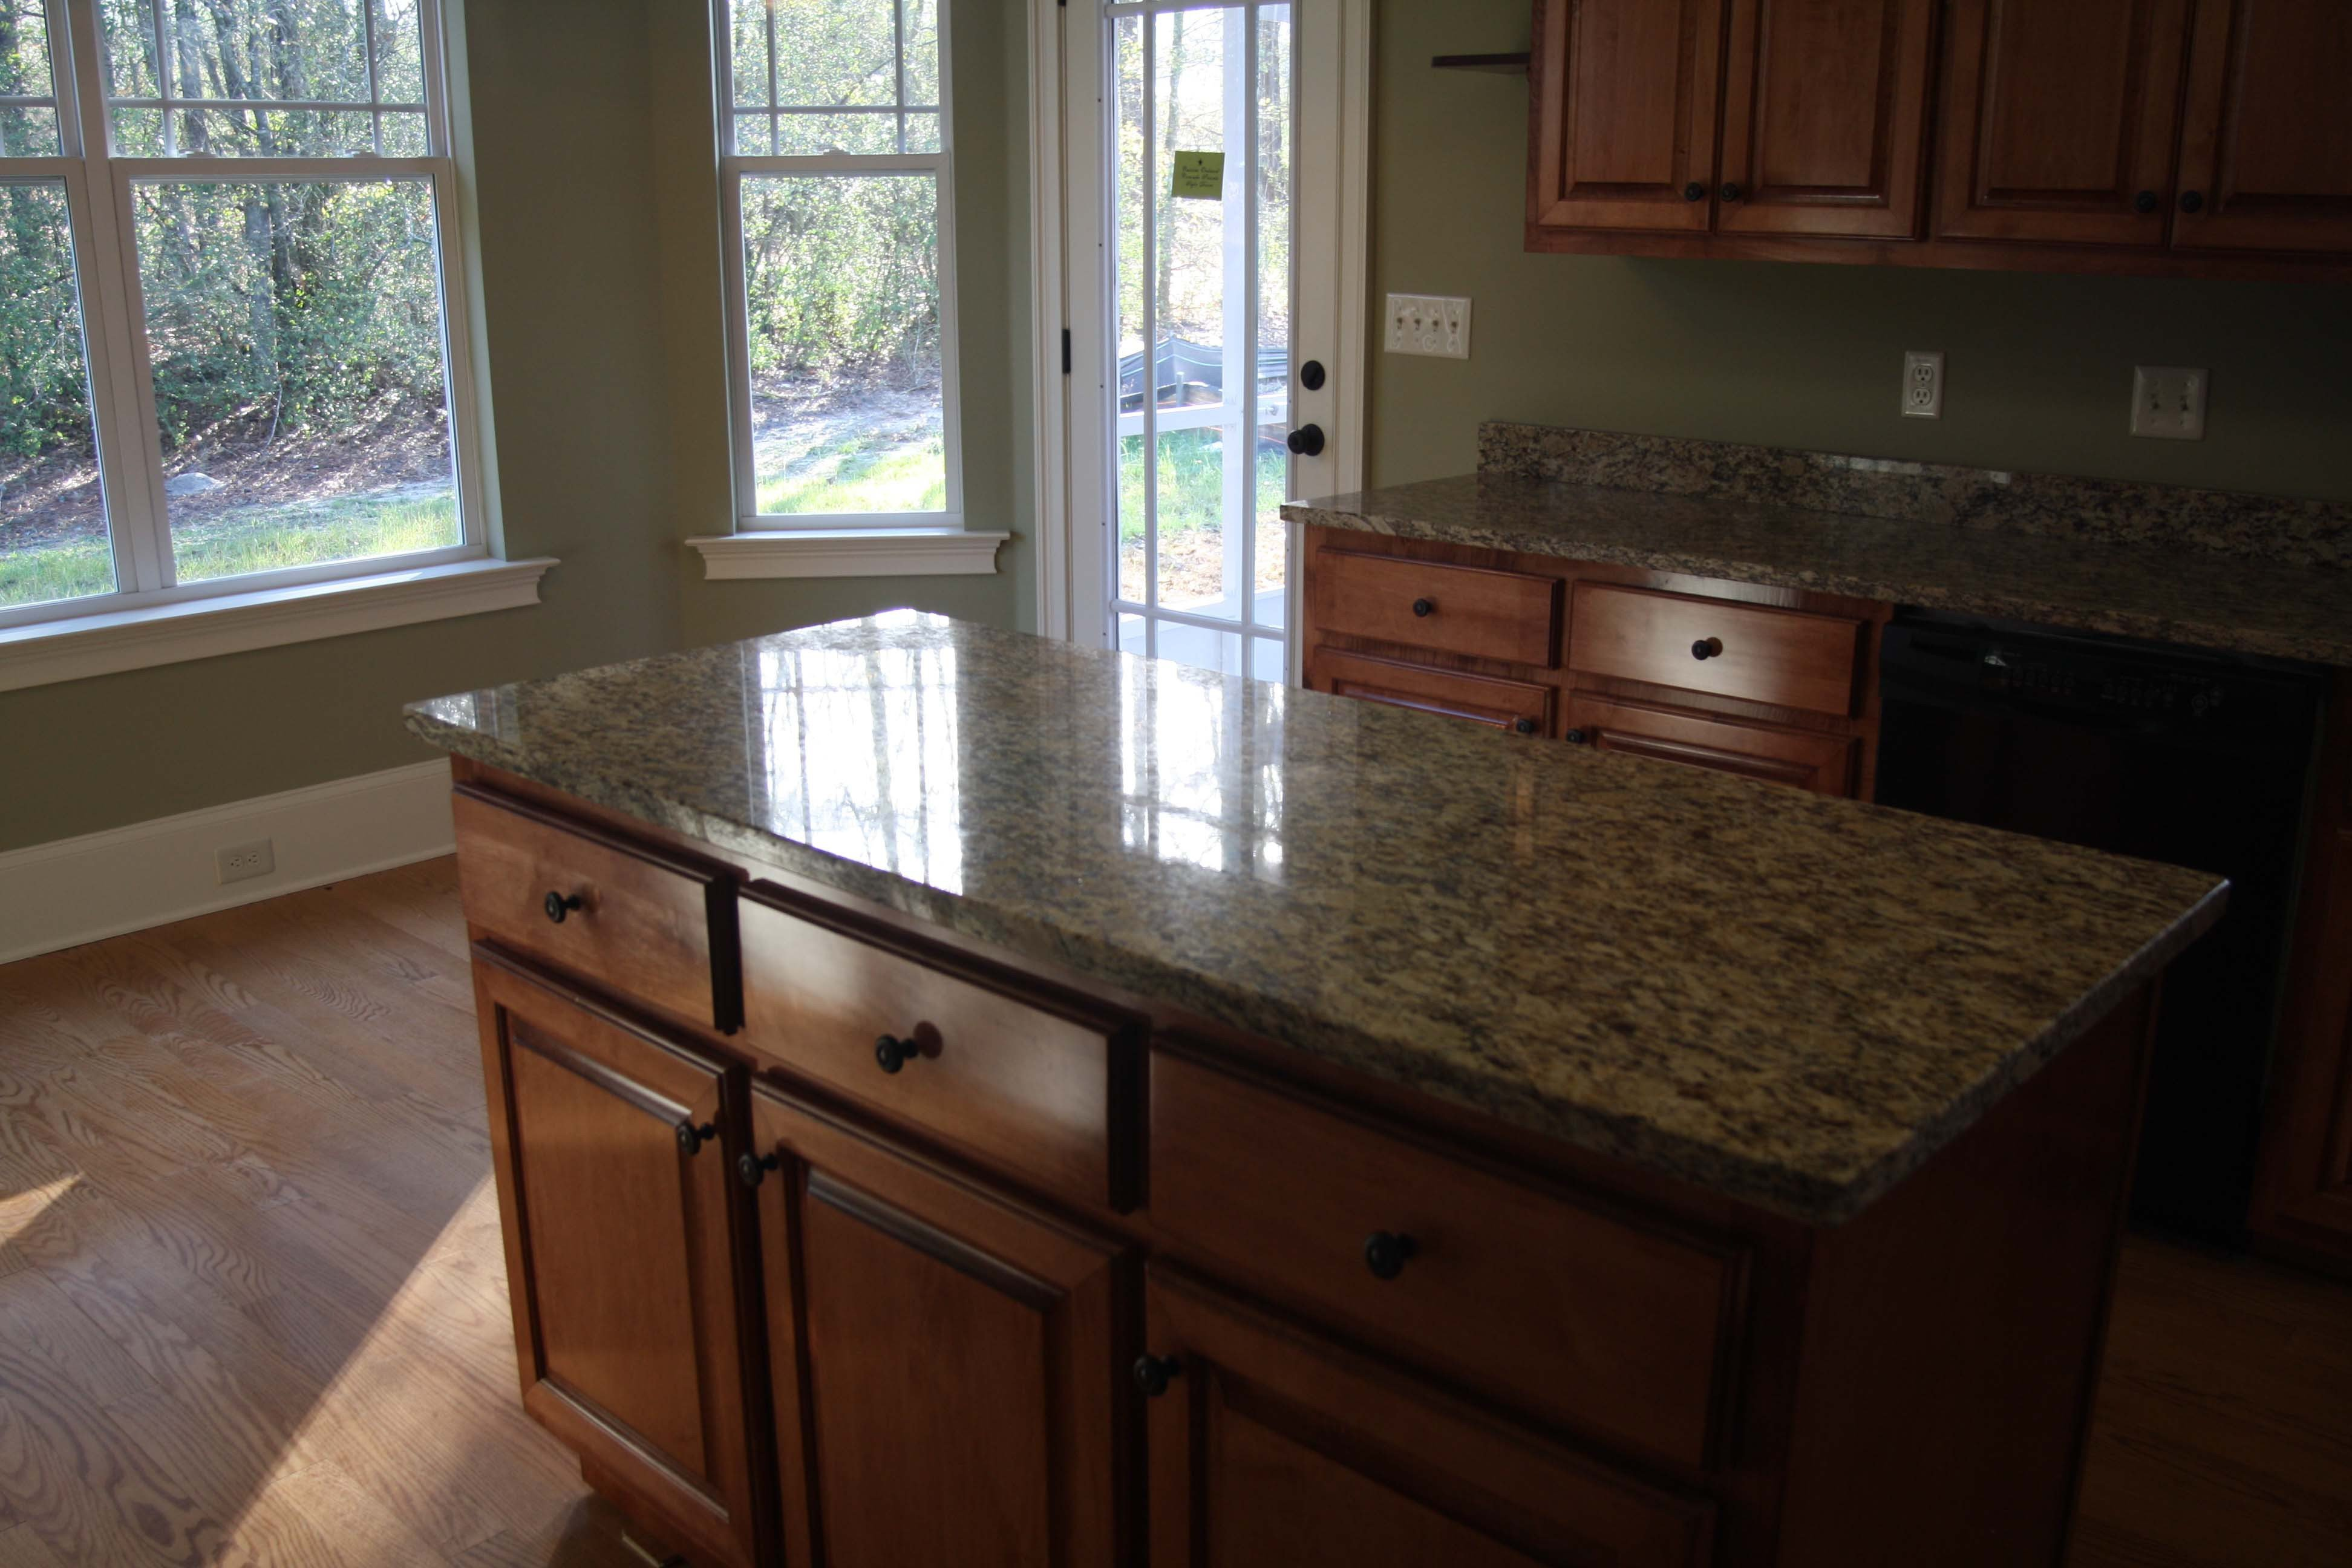 granites alloworigin disposition ga augusta accesskeyid granite countertops